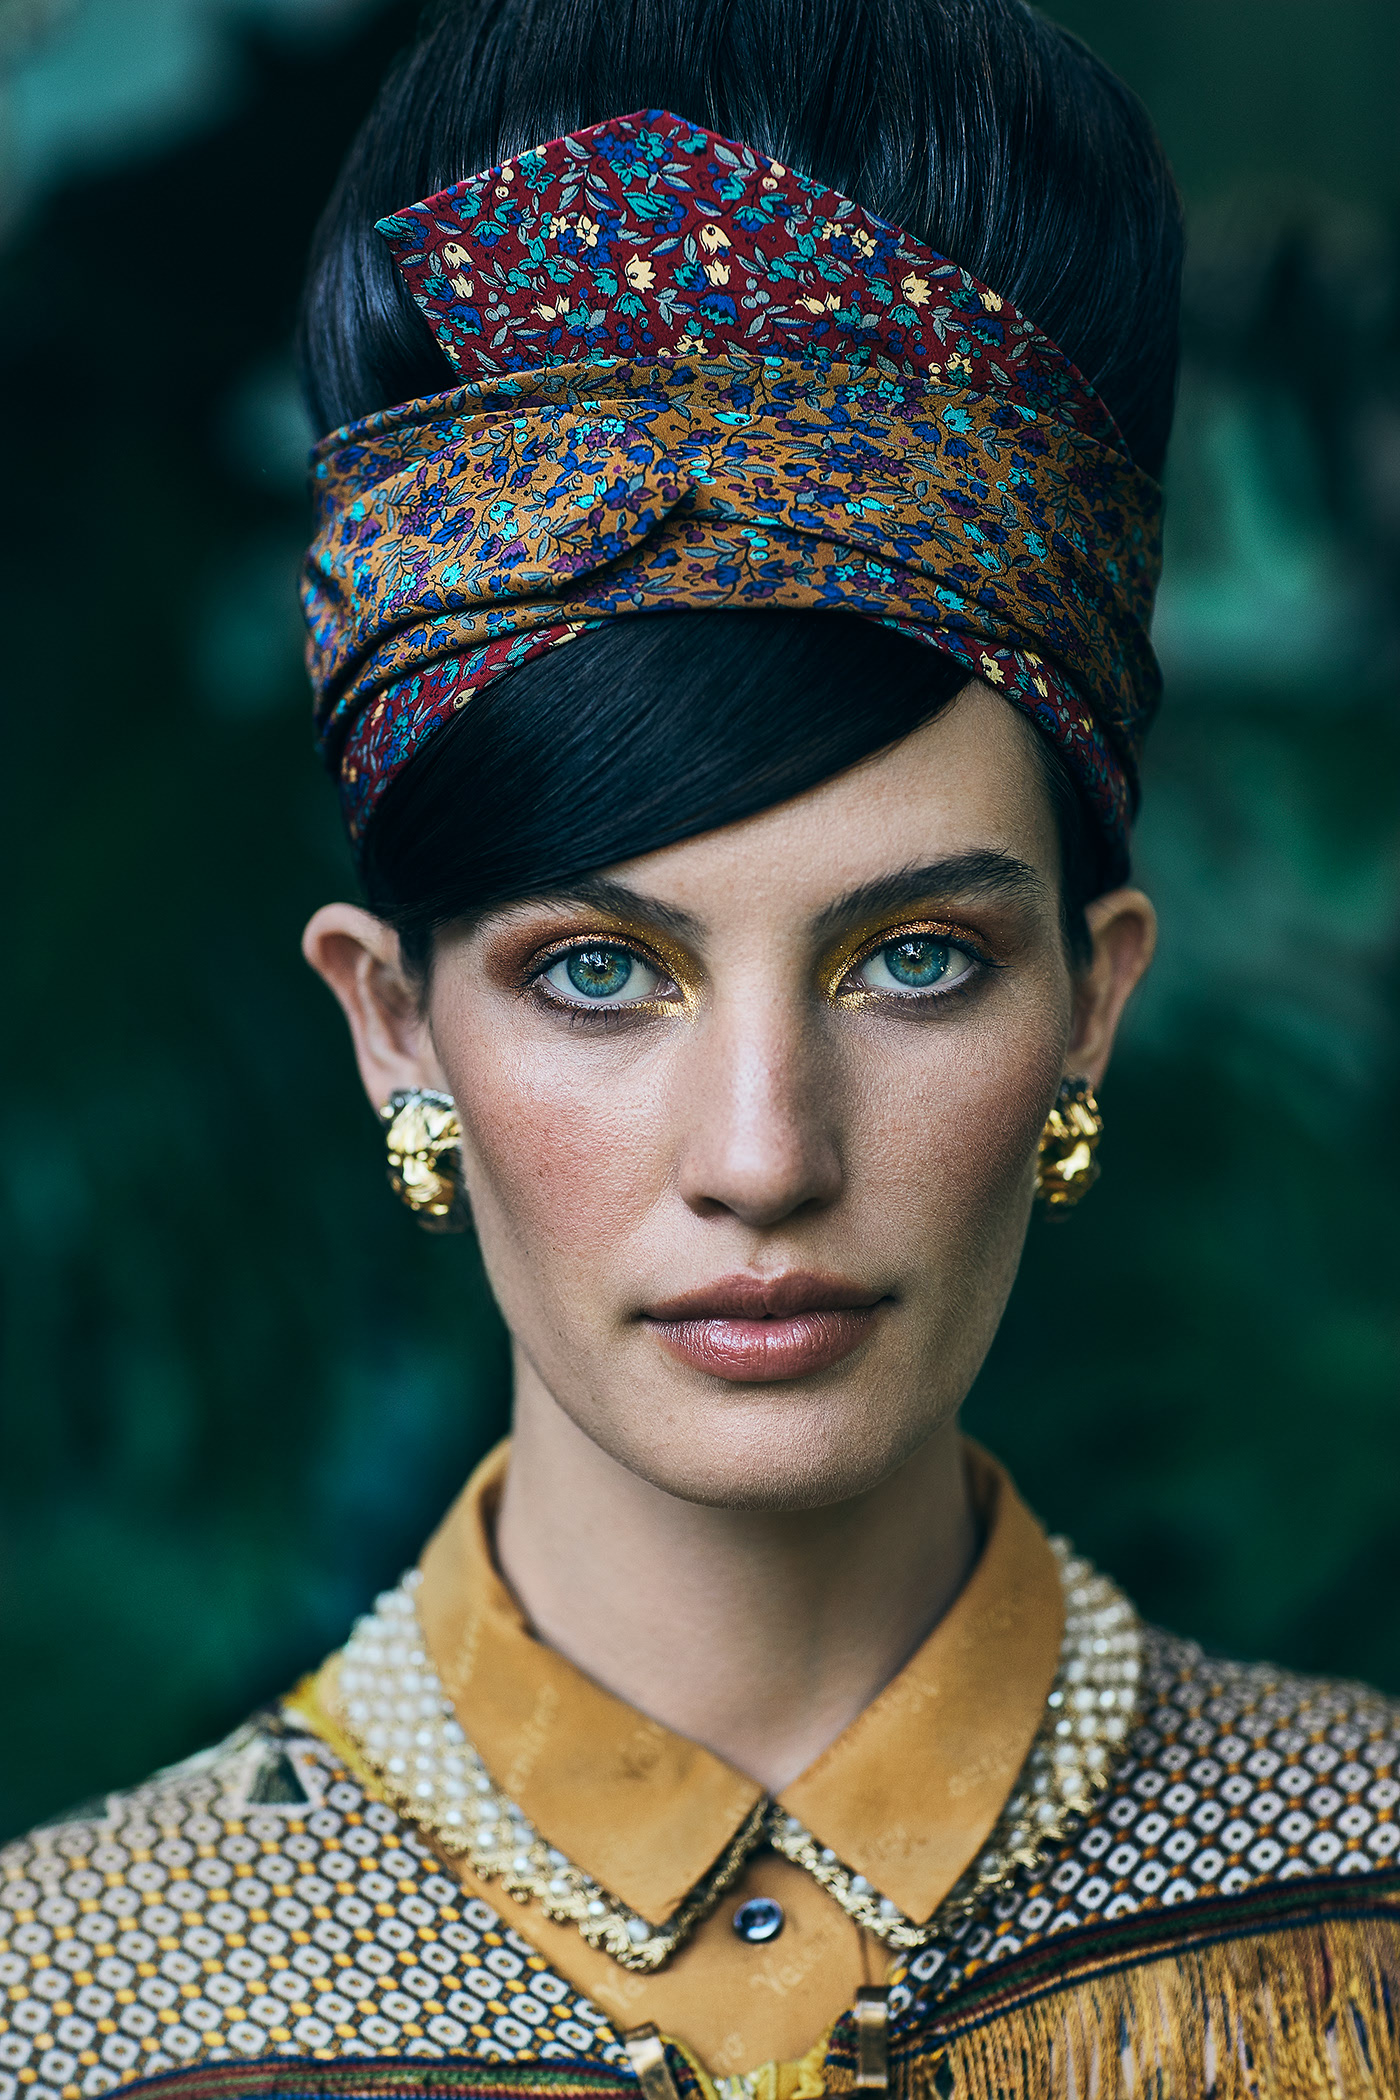 Dream team - Vogue Arabia